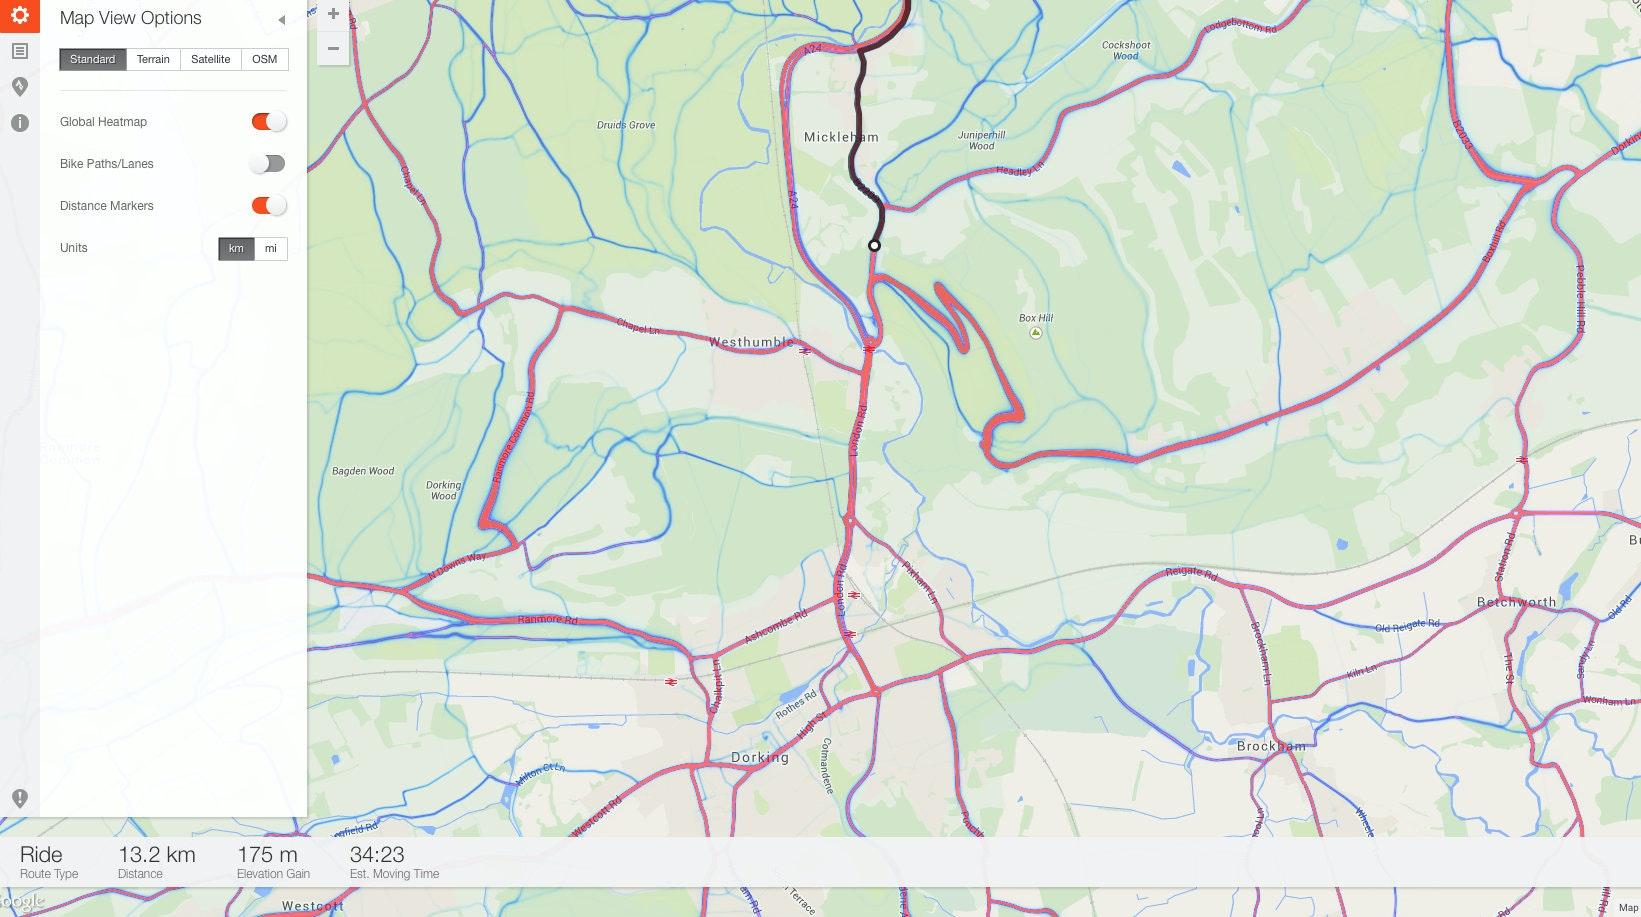 FM_Strava_TWC_Heatmaps